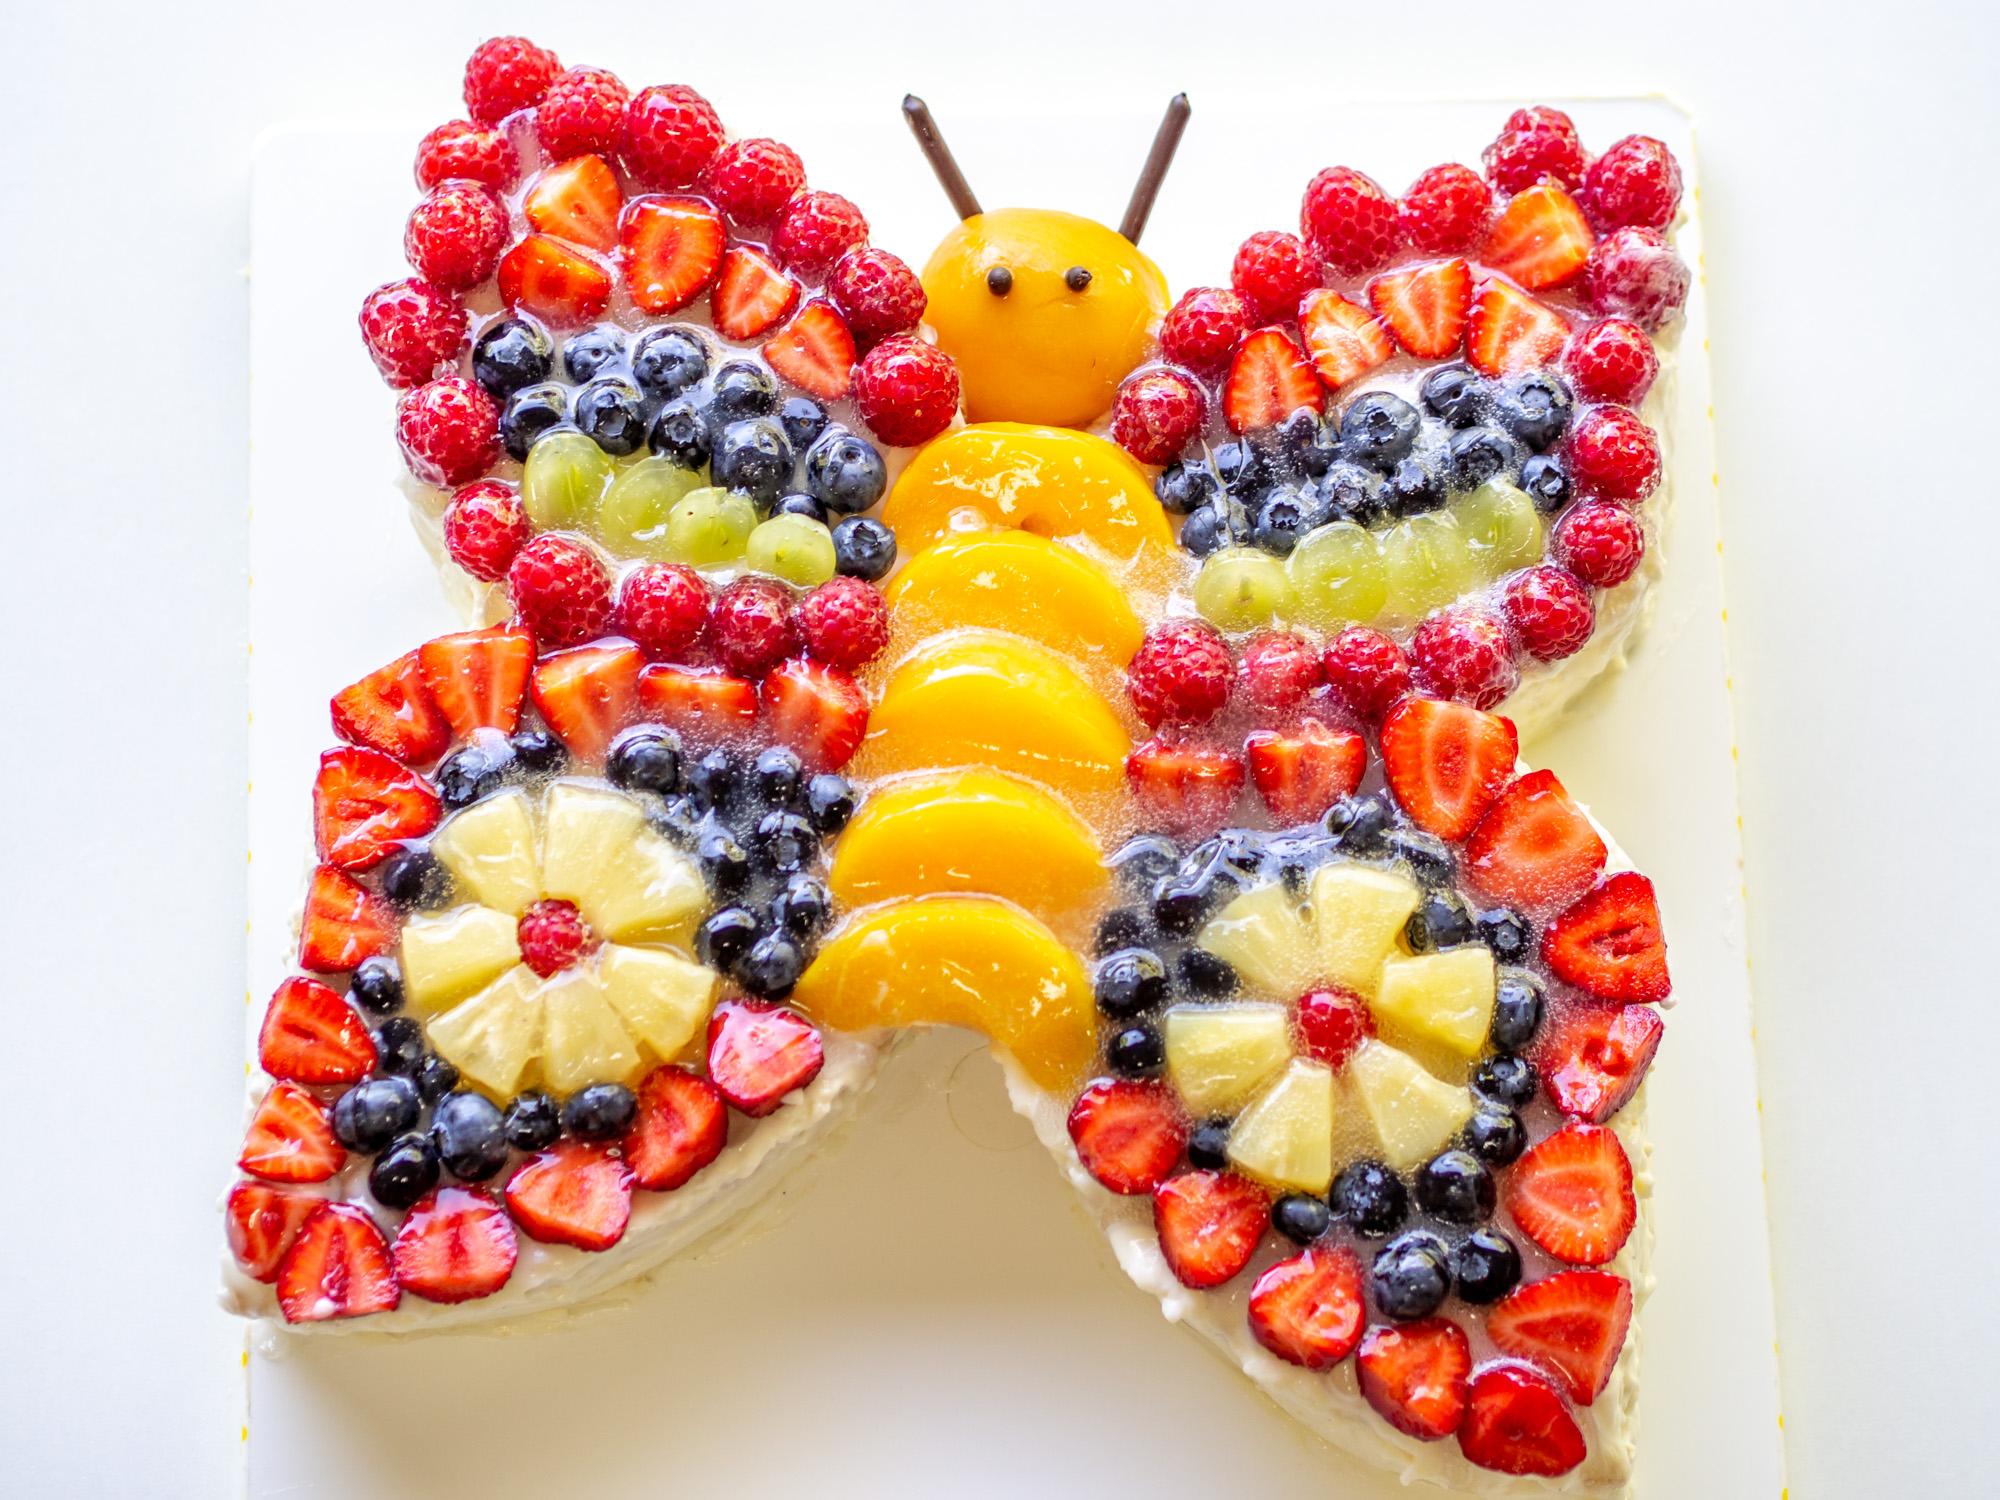 Bunter Schmetterlingstorte Mit Viel Obst Dekoriert Perfekt Fur